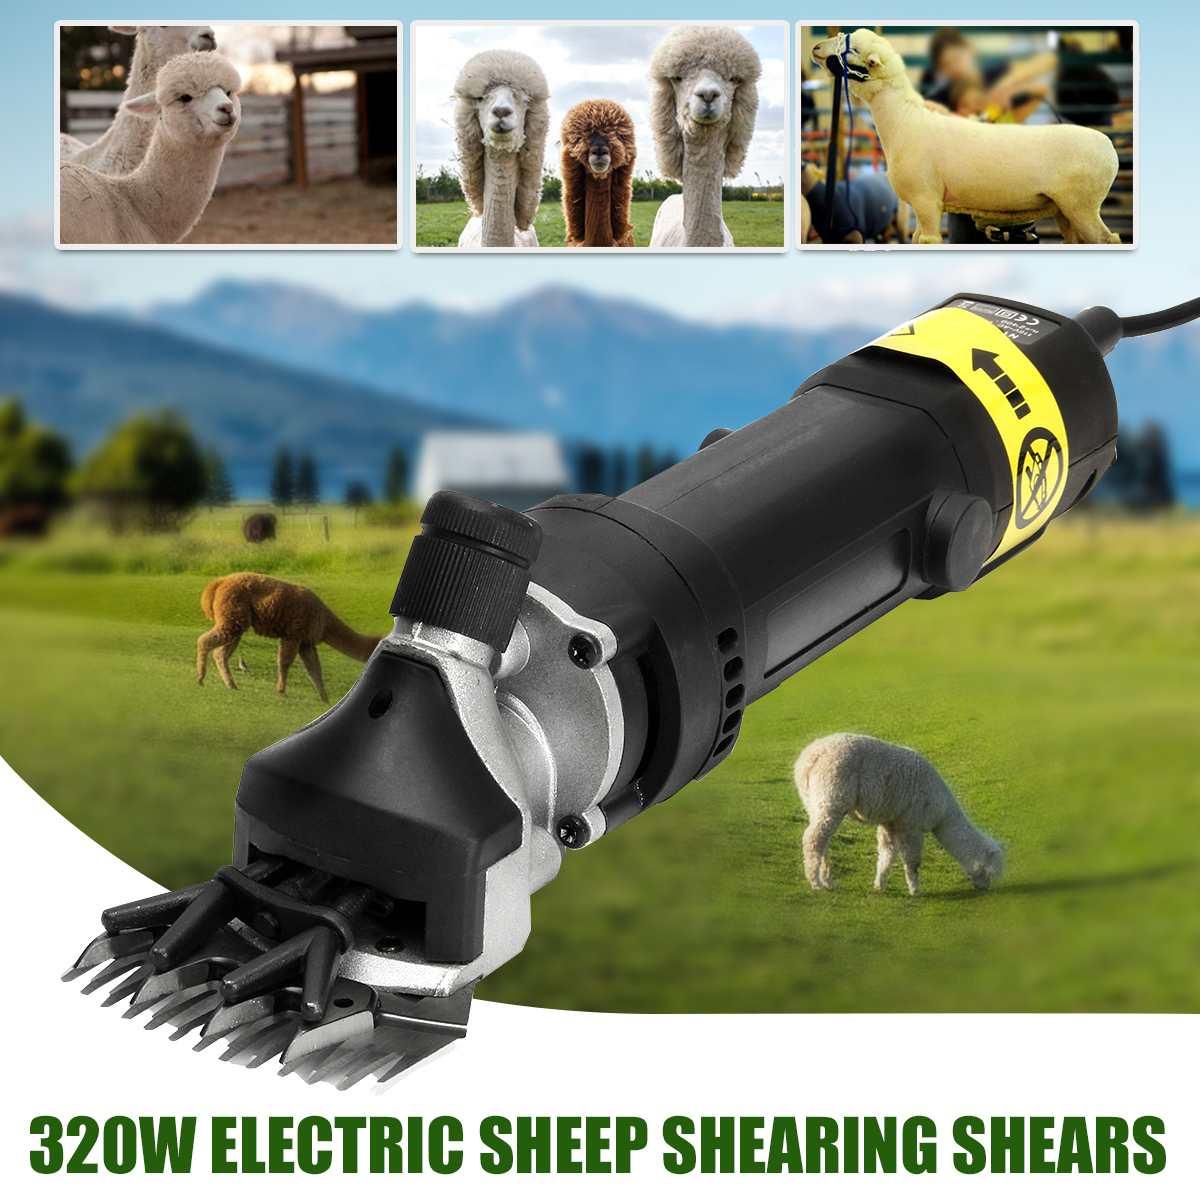 320W Electric Wool Shearing Scissors UK 220V US 110V Electric Sheep Goat Alpaca Pro Animal Groomer Clippers Wool Shearing Shears